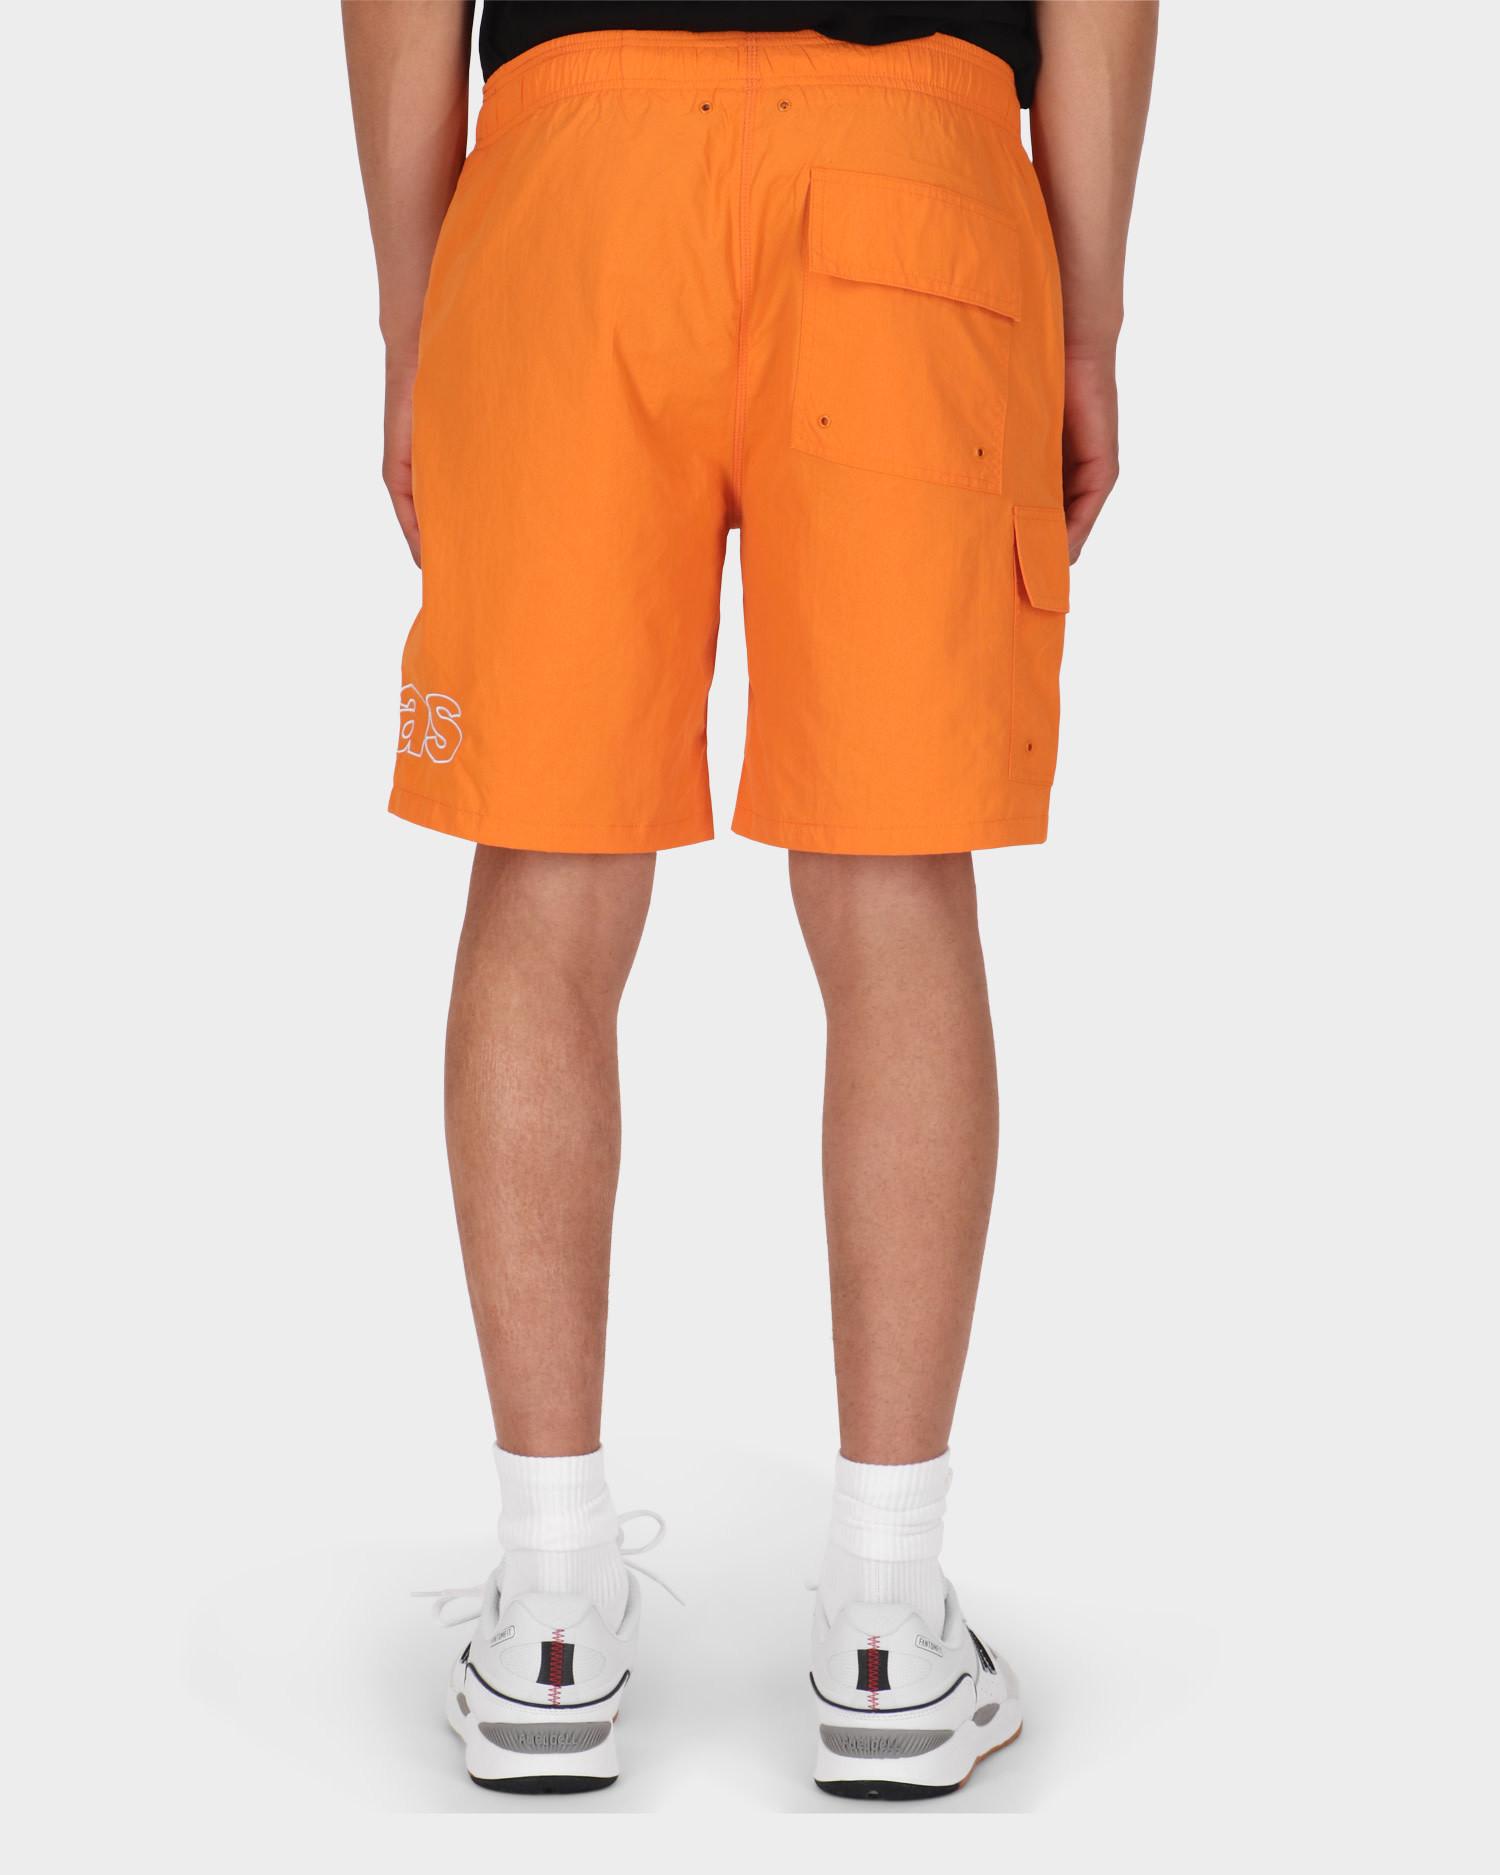 Helas Chroma Shorts Orange